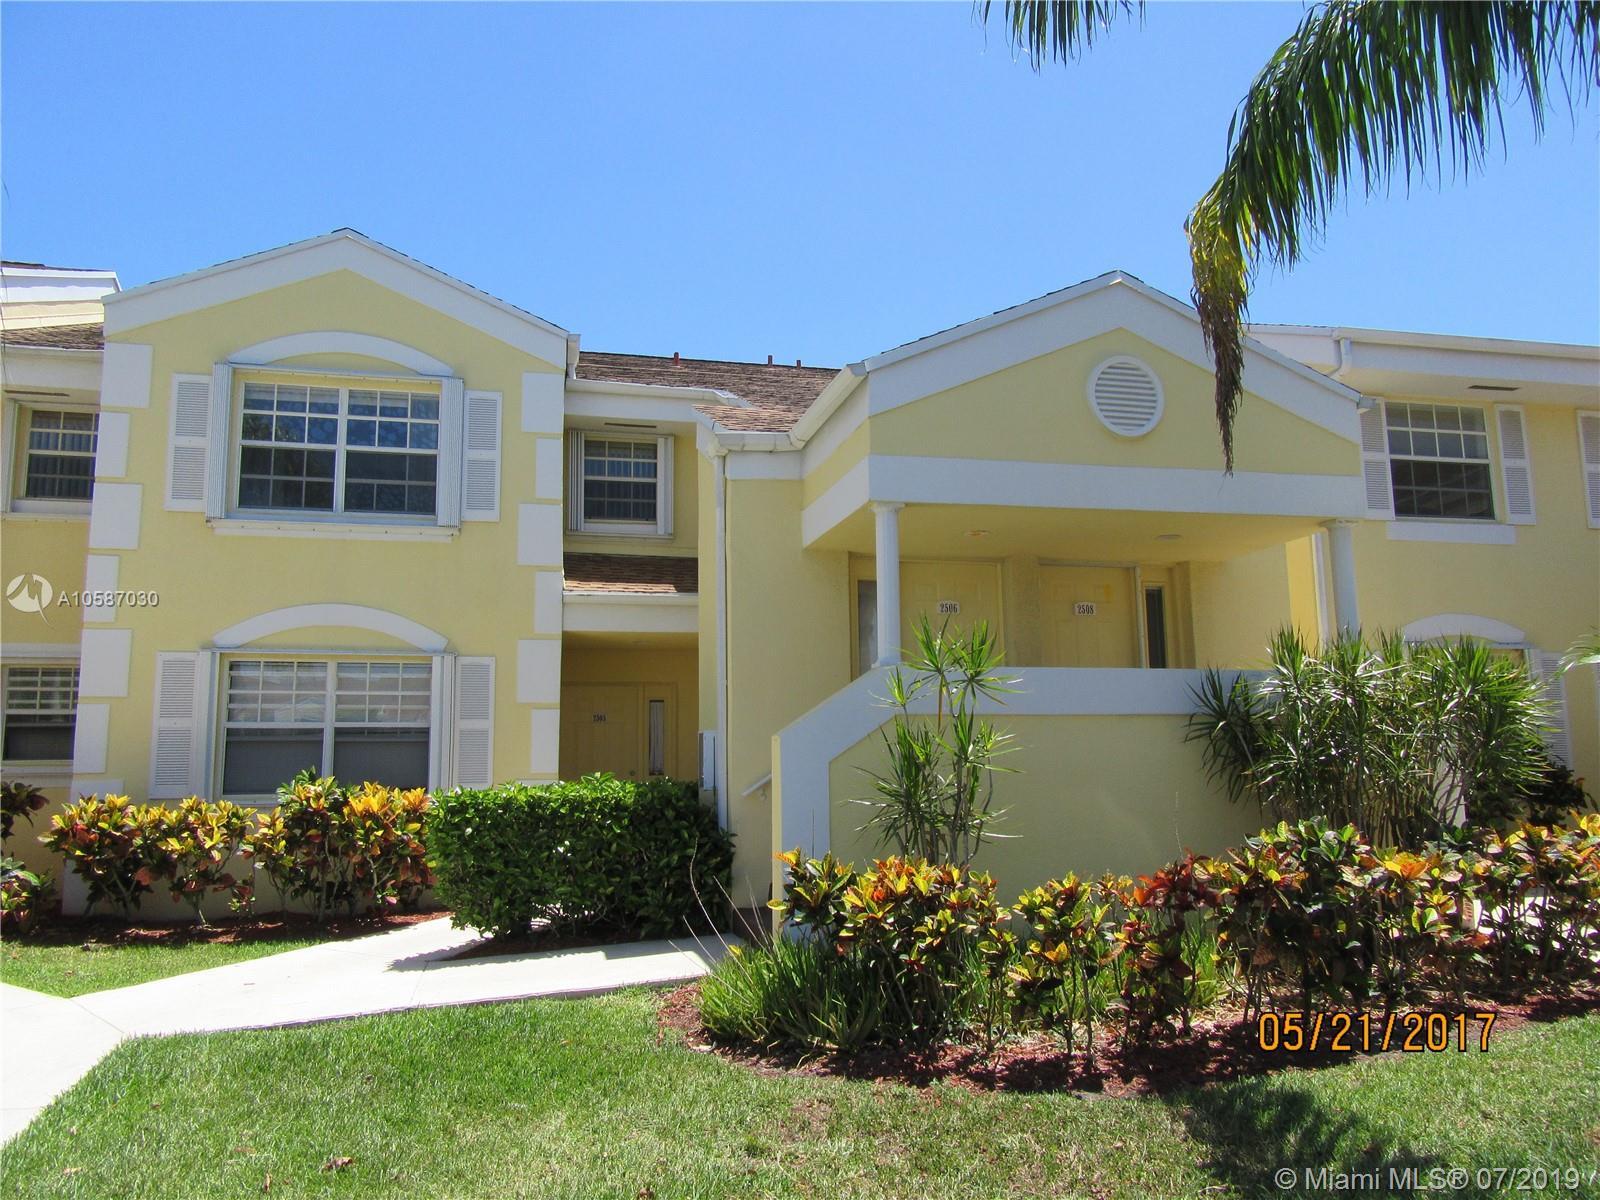 Keys Gate Condo No Two Real Estate Listings Main Image